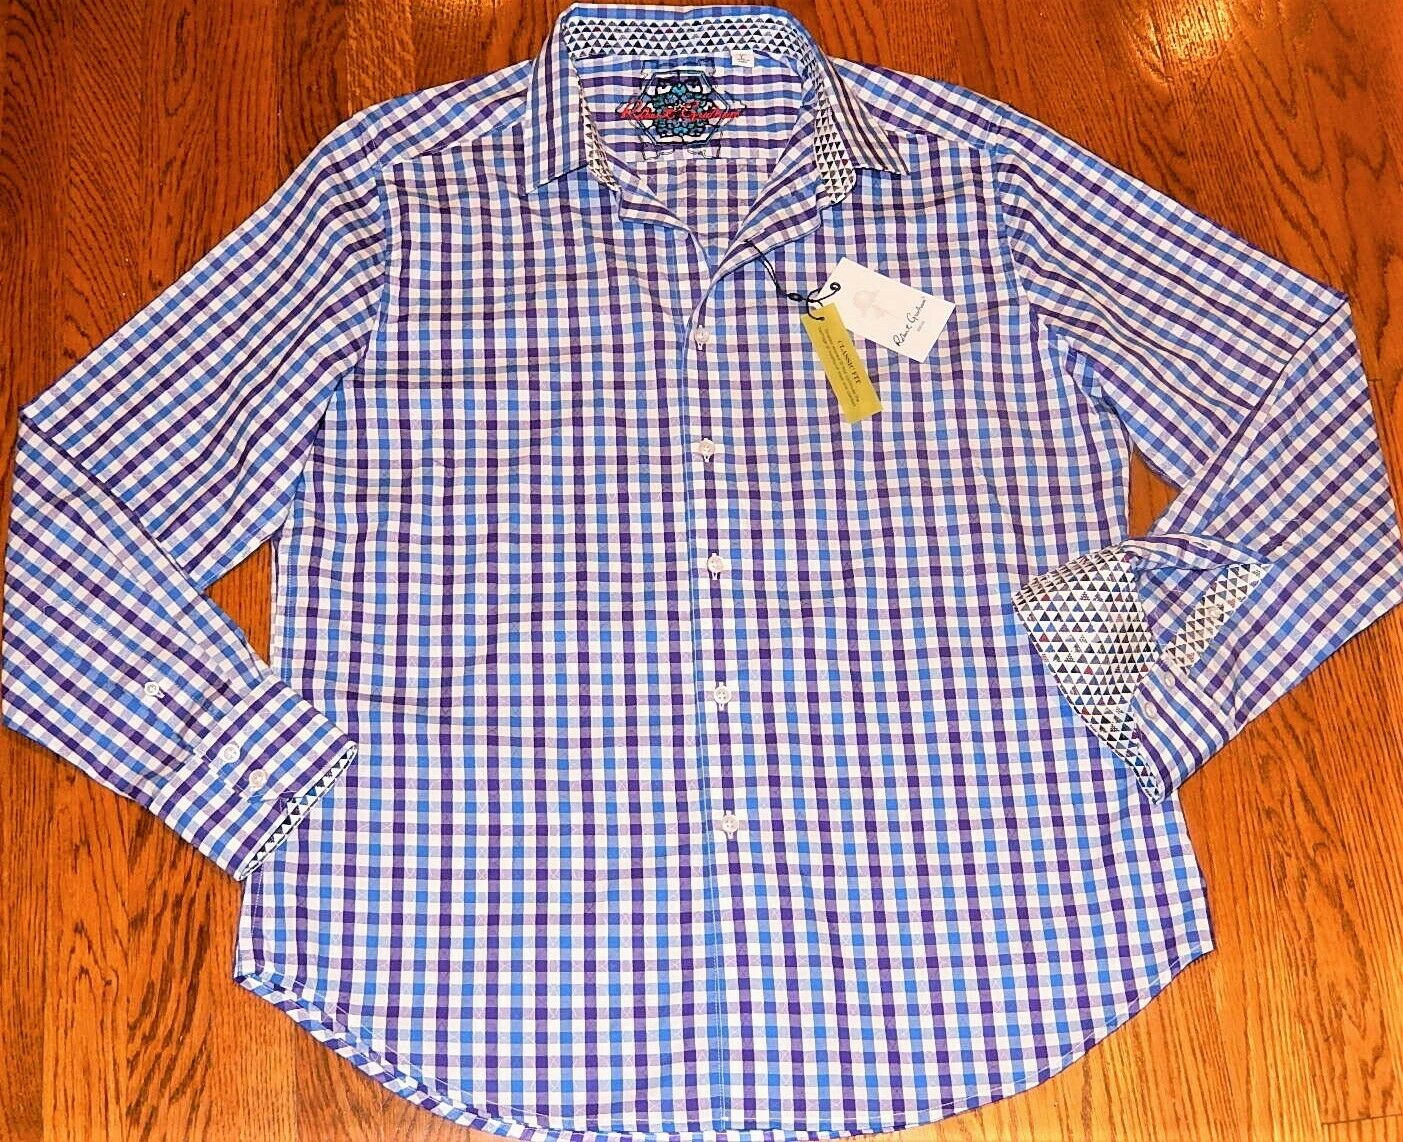 ROBERT GRAHAM herren ORIGINAL BRAND NEW AUTHENTIC DRESS hemd Größe L (groß), NWT